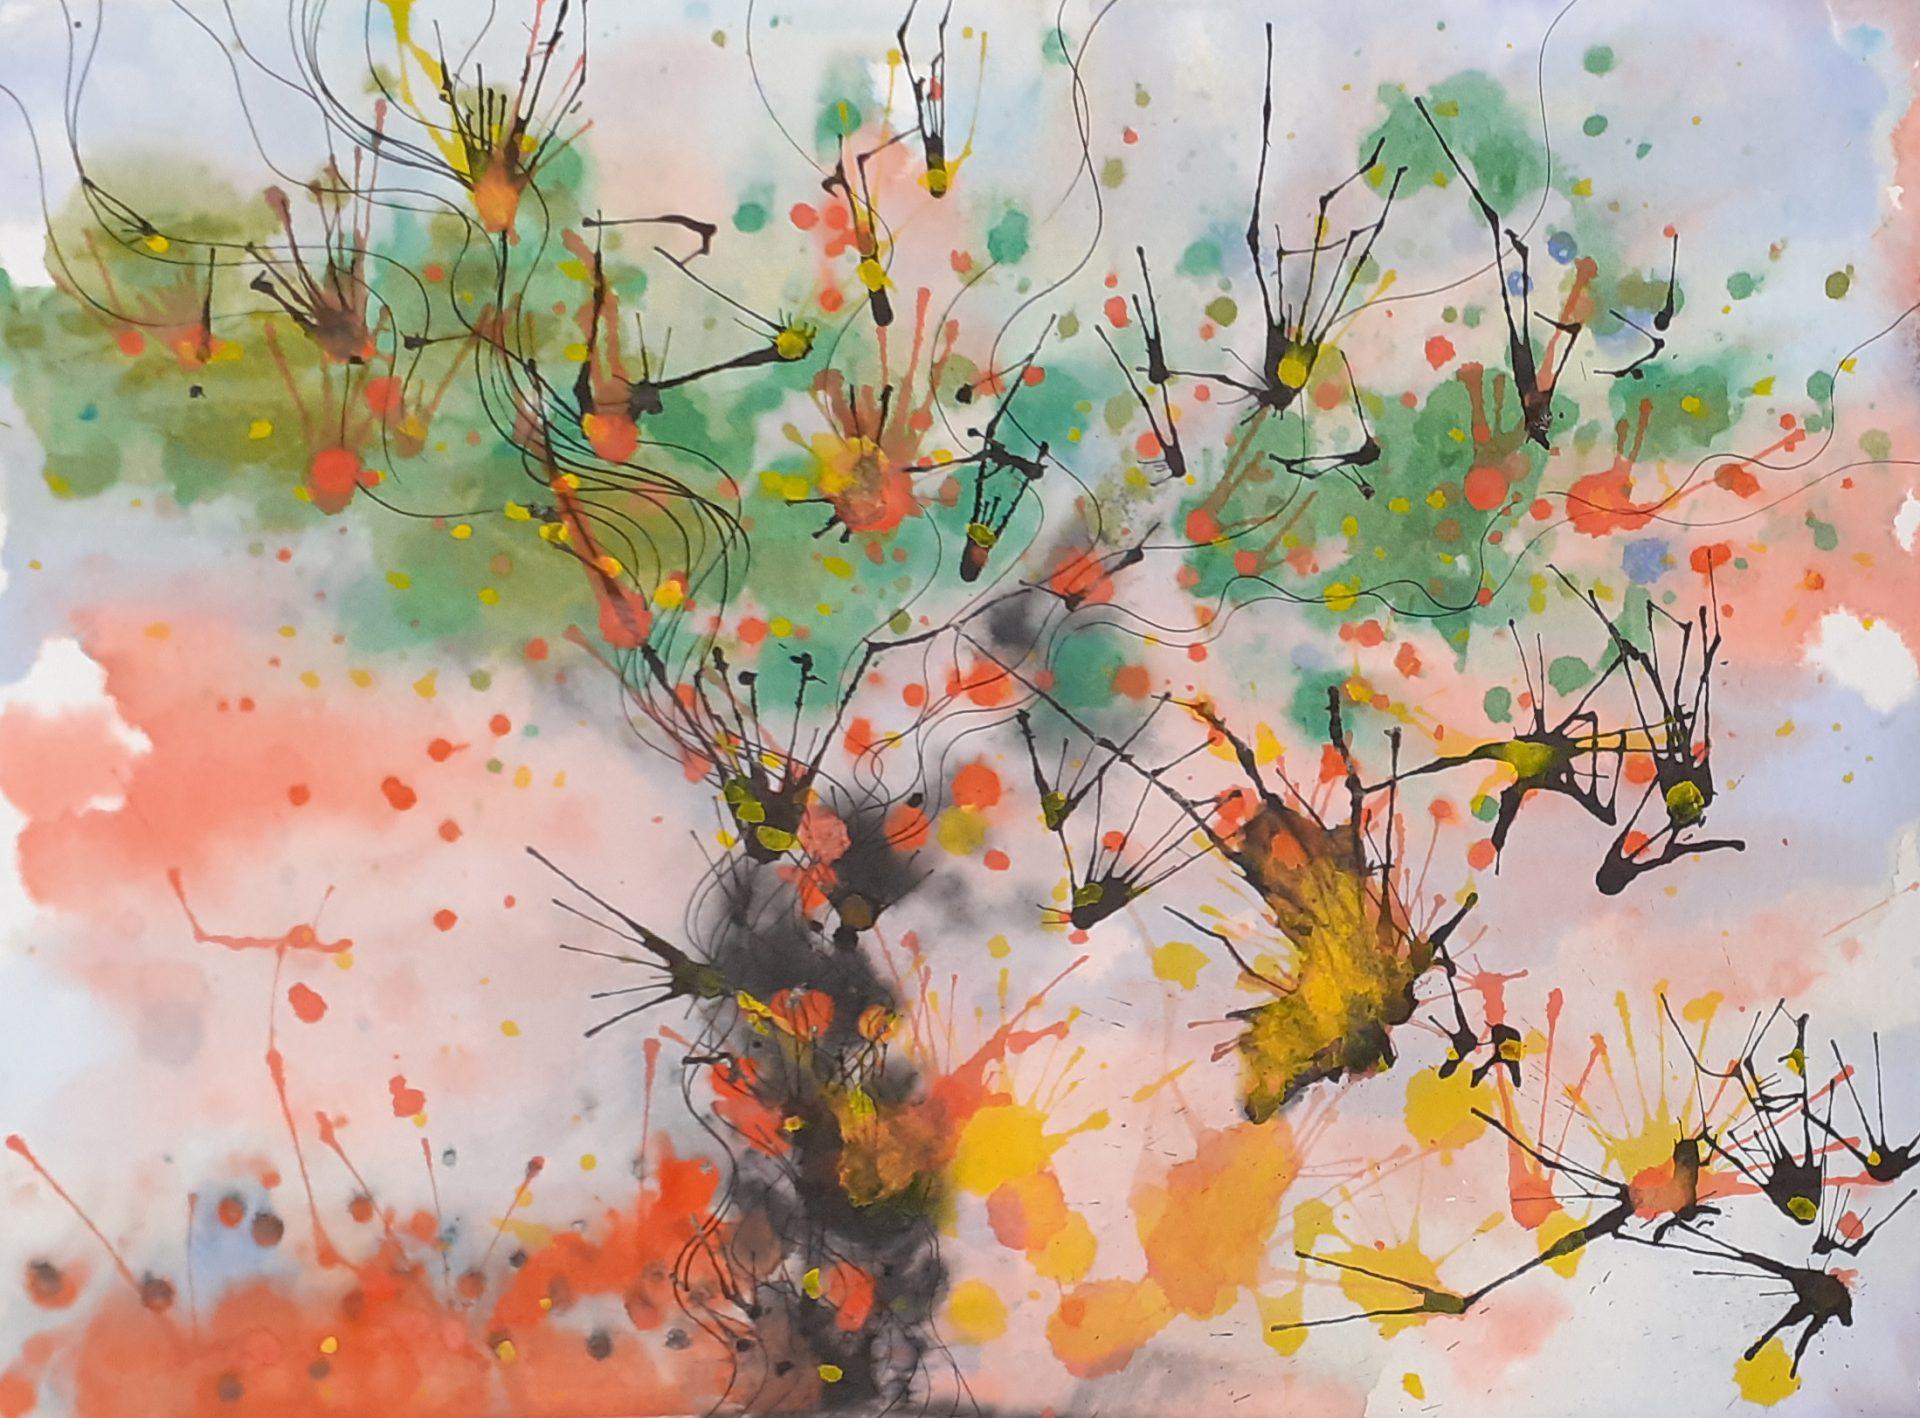 Mista - aquarela, guache e nanquim sobre papel - 28,3x38,7 (2020)